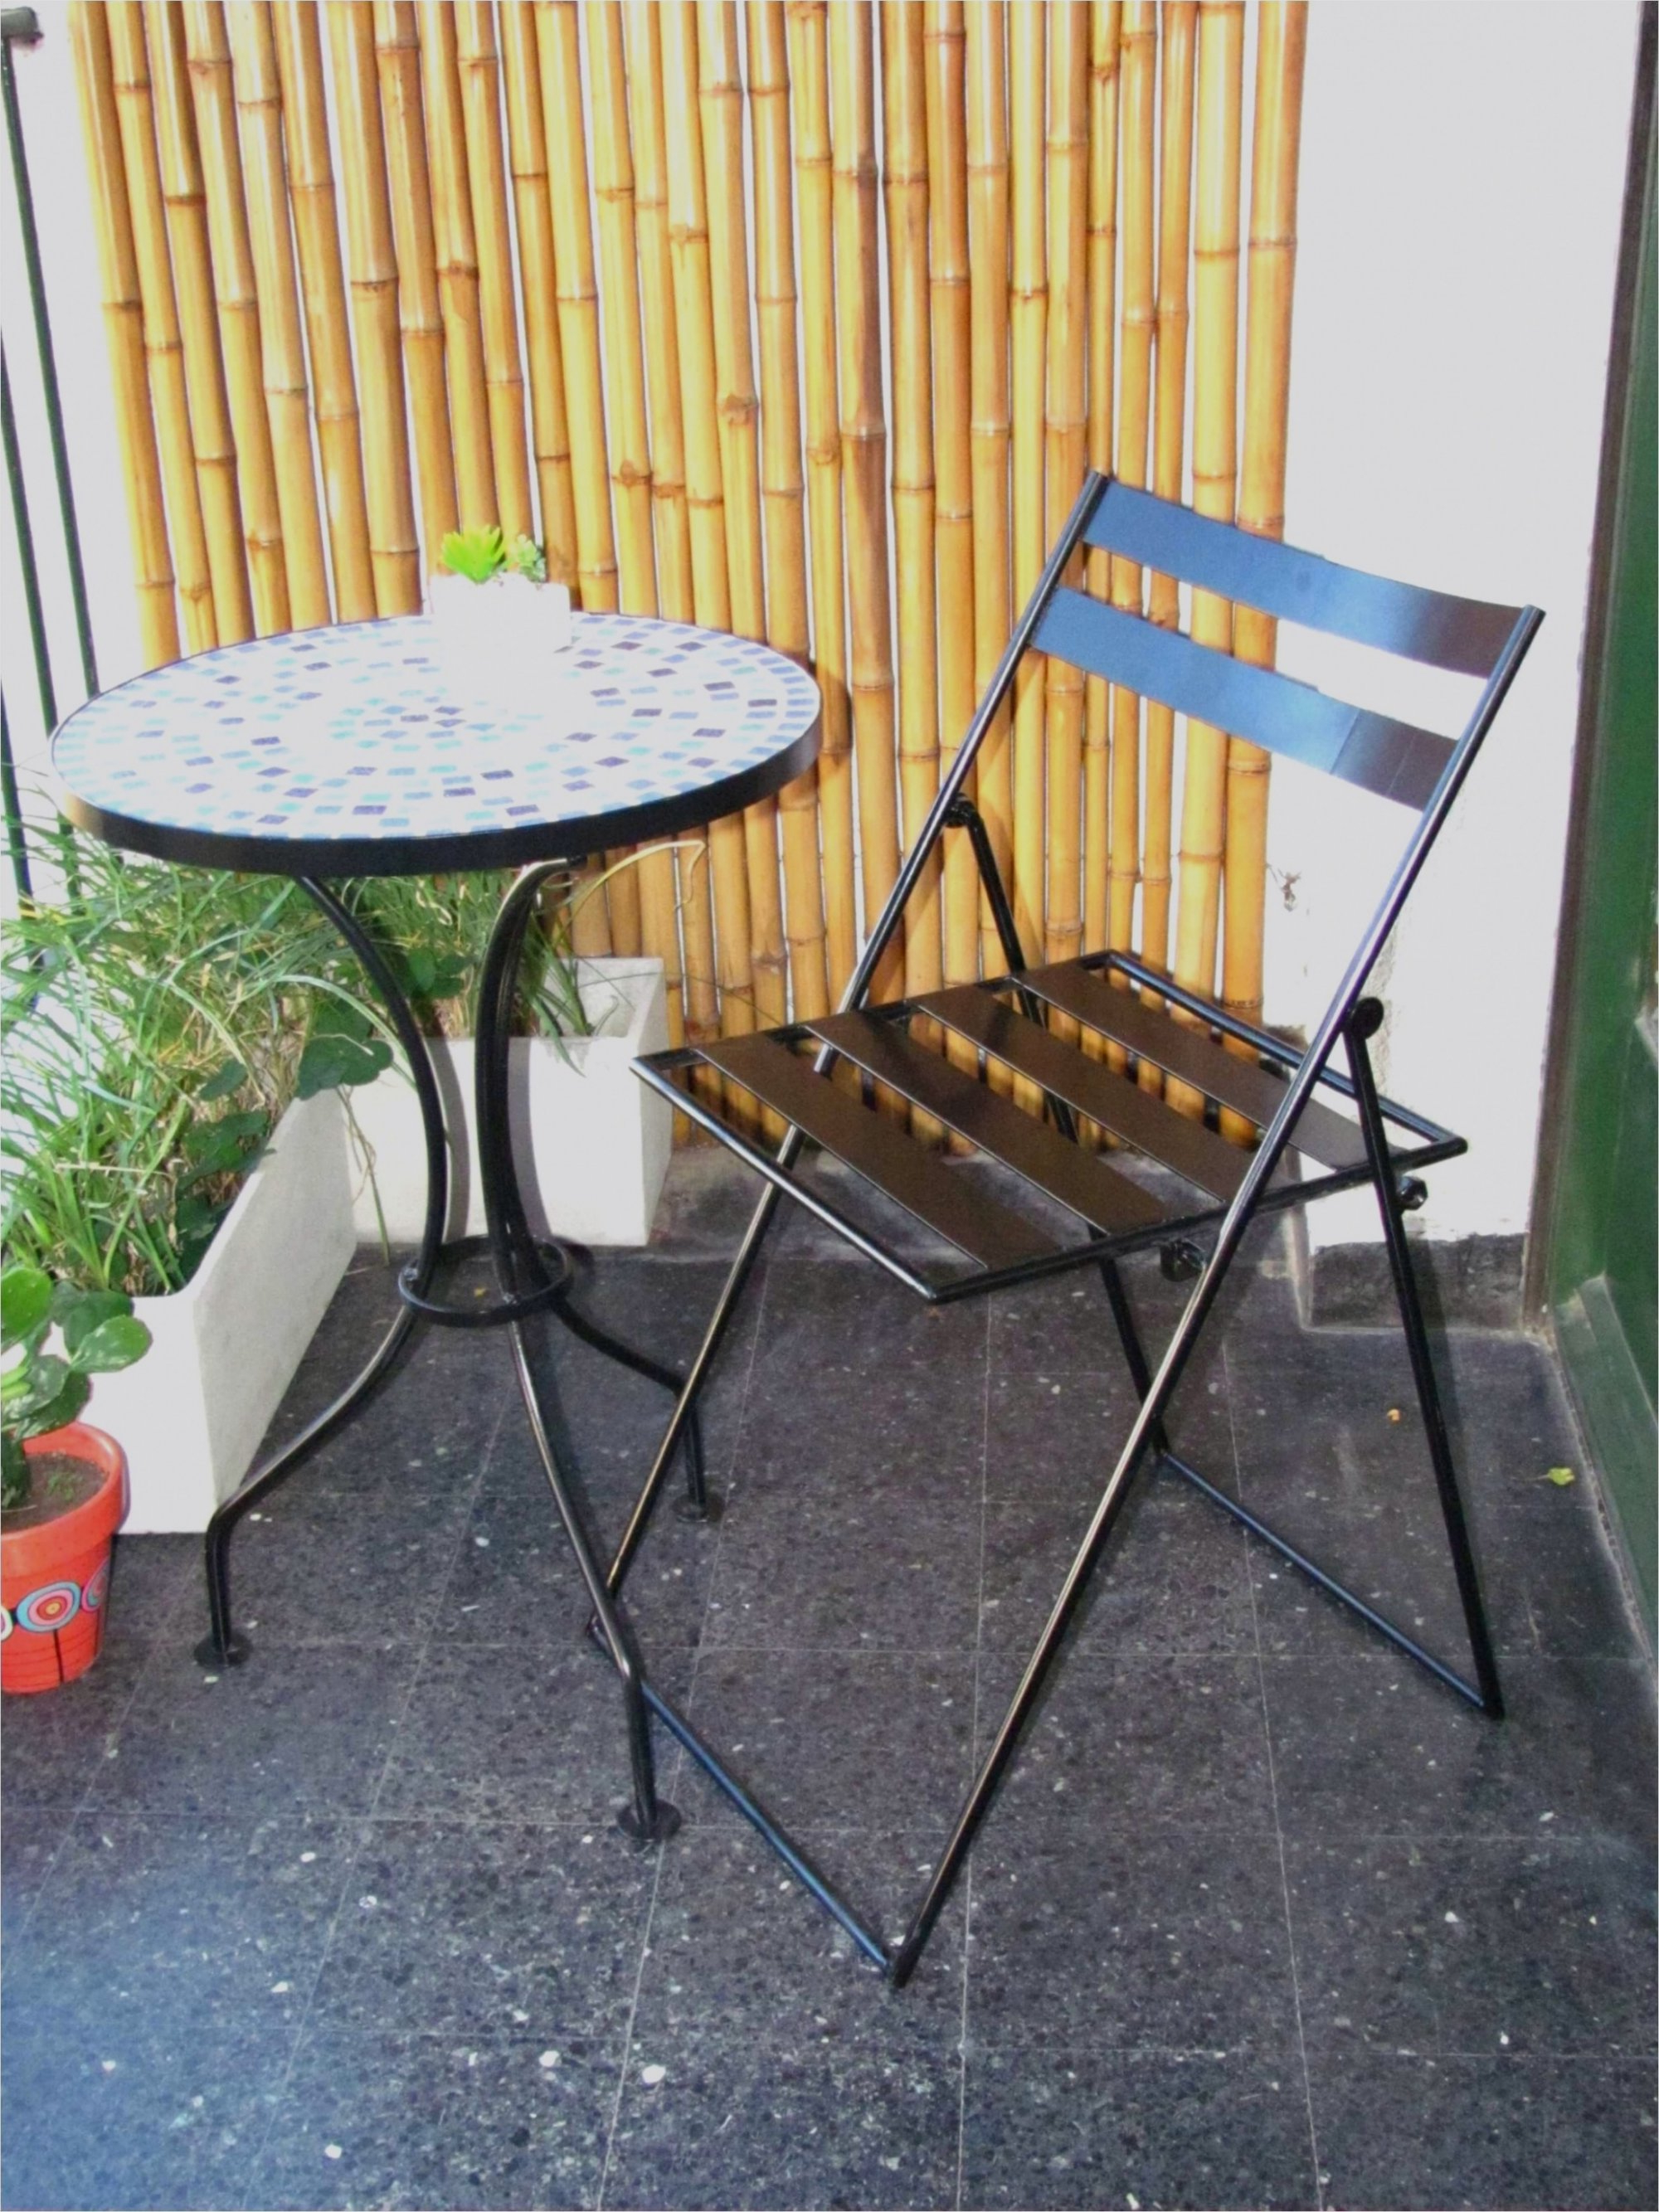 Mobiliario Jardin Carrefour Rldj Mobiliario Jardin Encantador Table De Jardin Carrefour Fresh